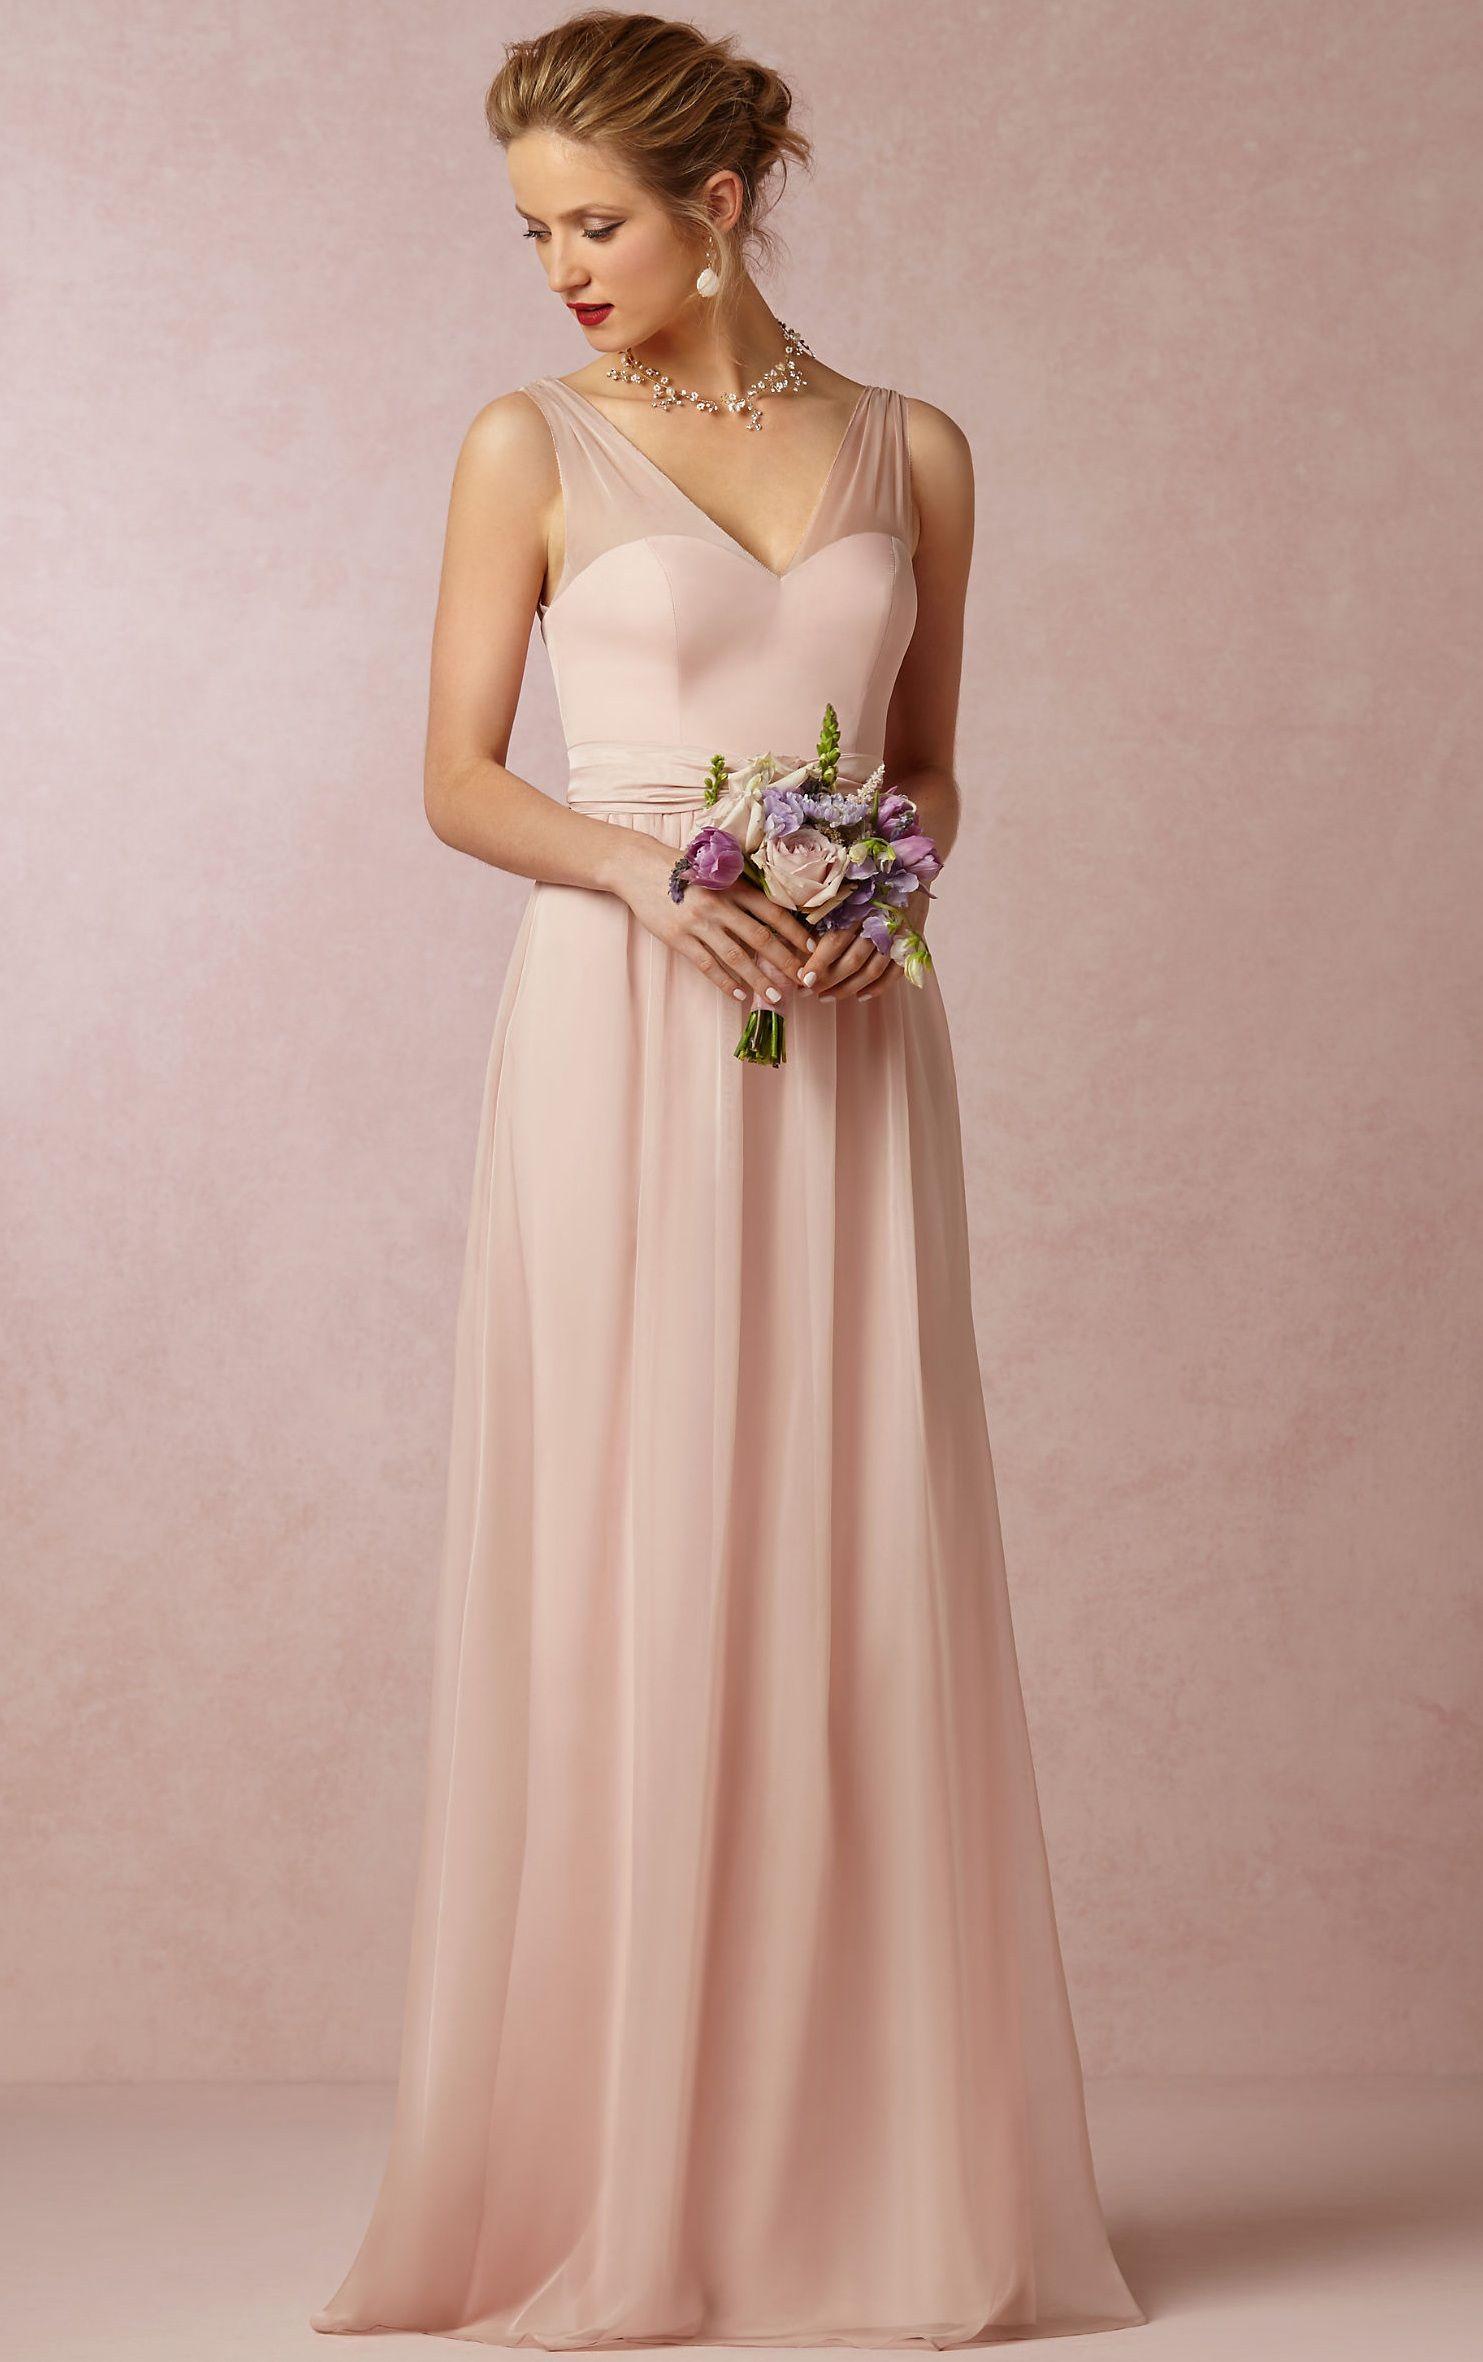 modelo simples e bonito! | damas de honor | Pinterest | Bonito ...